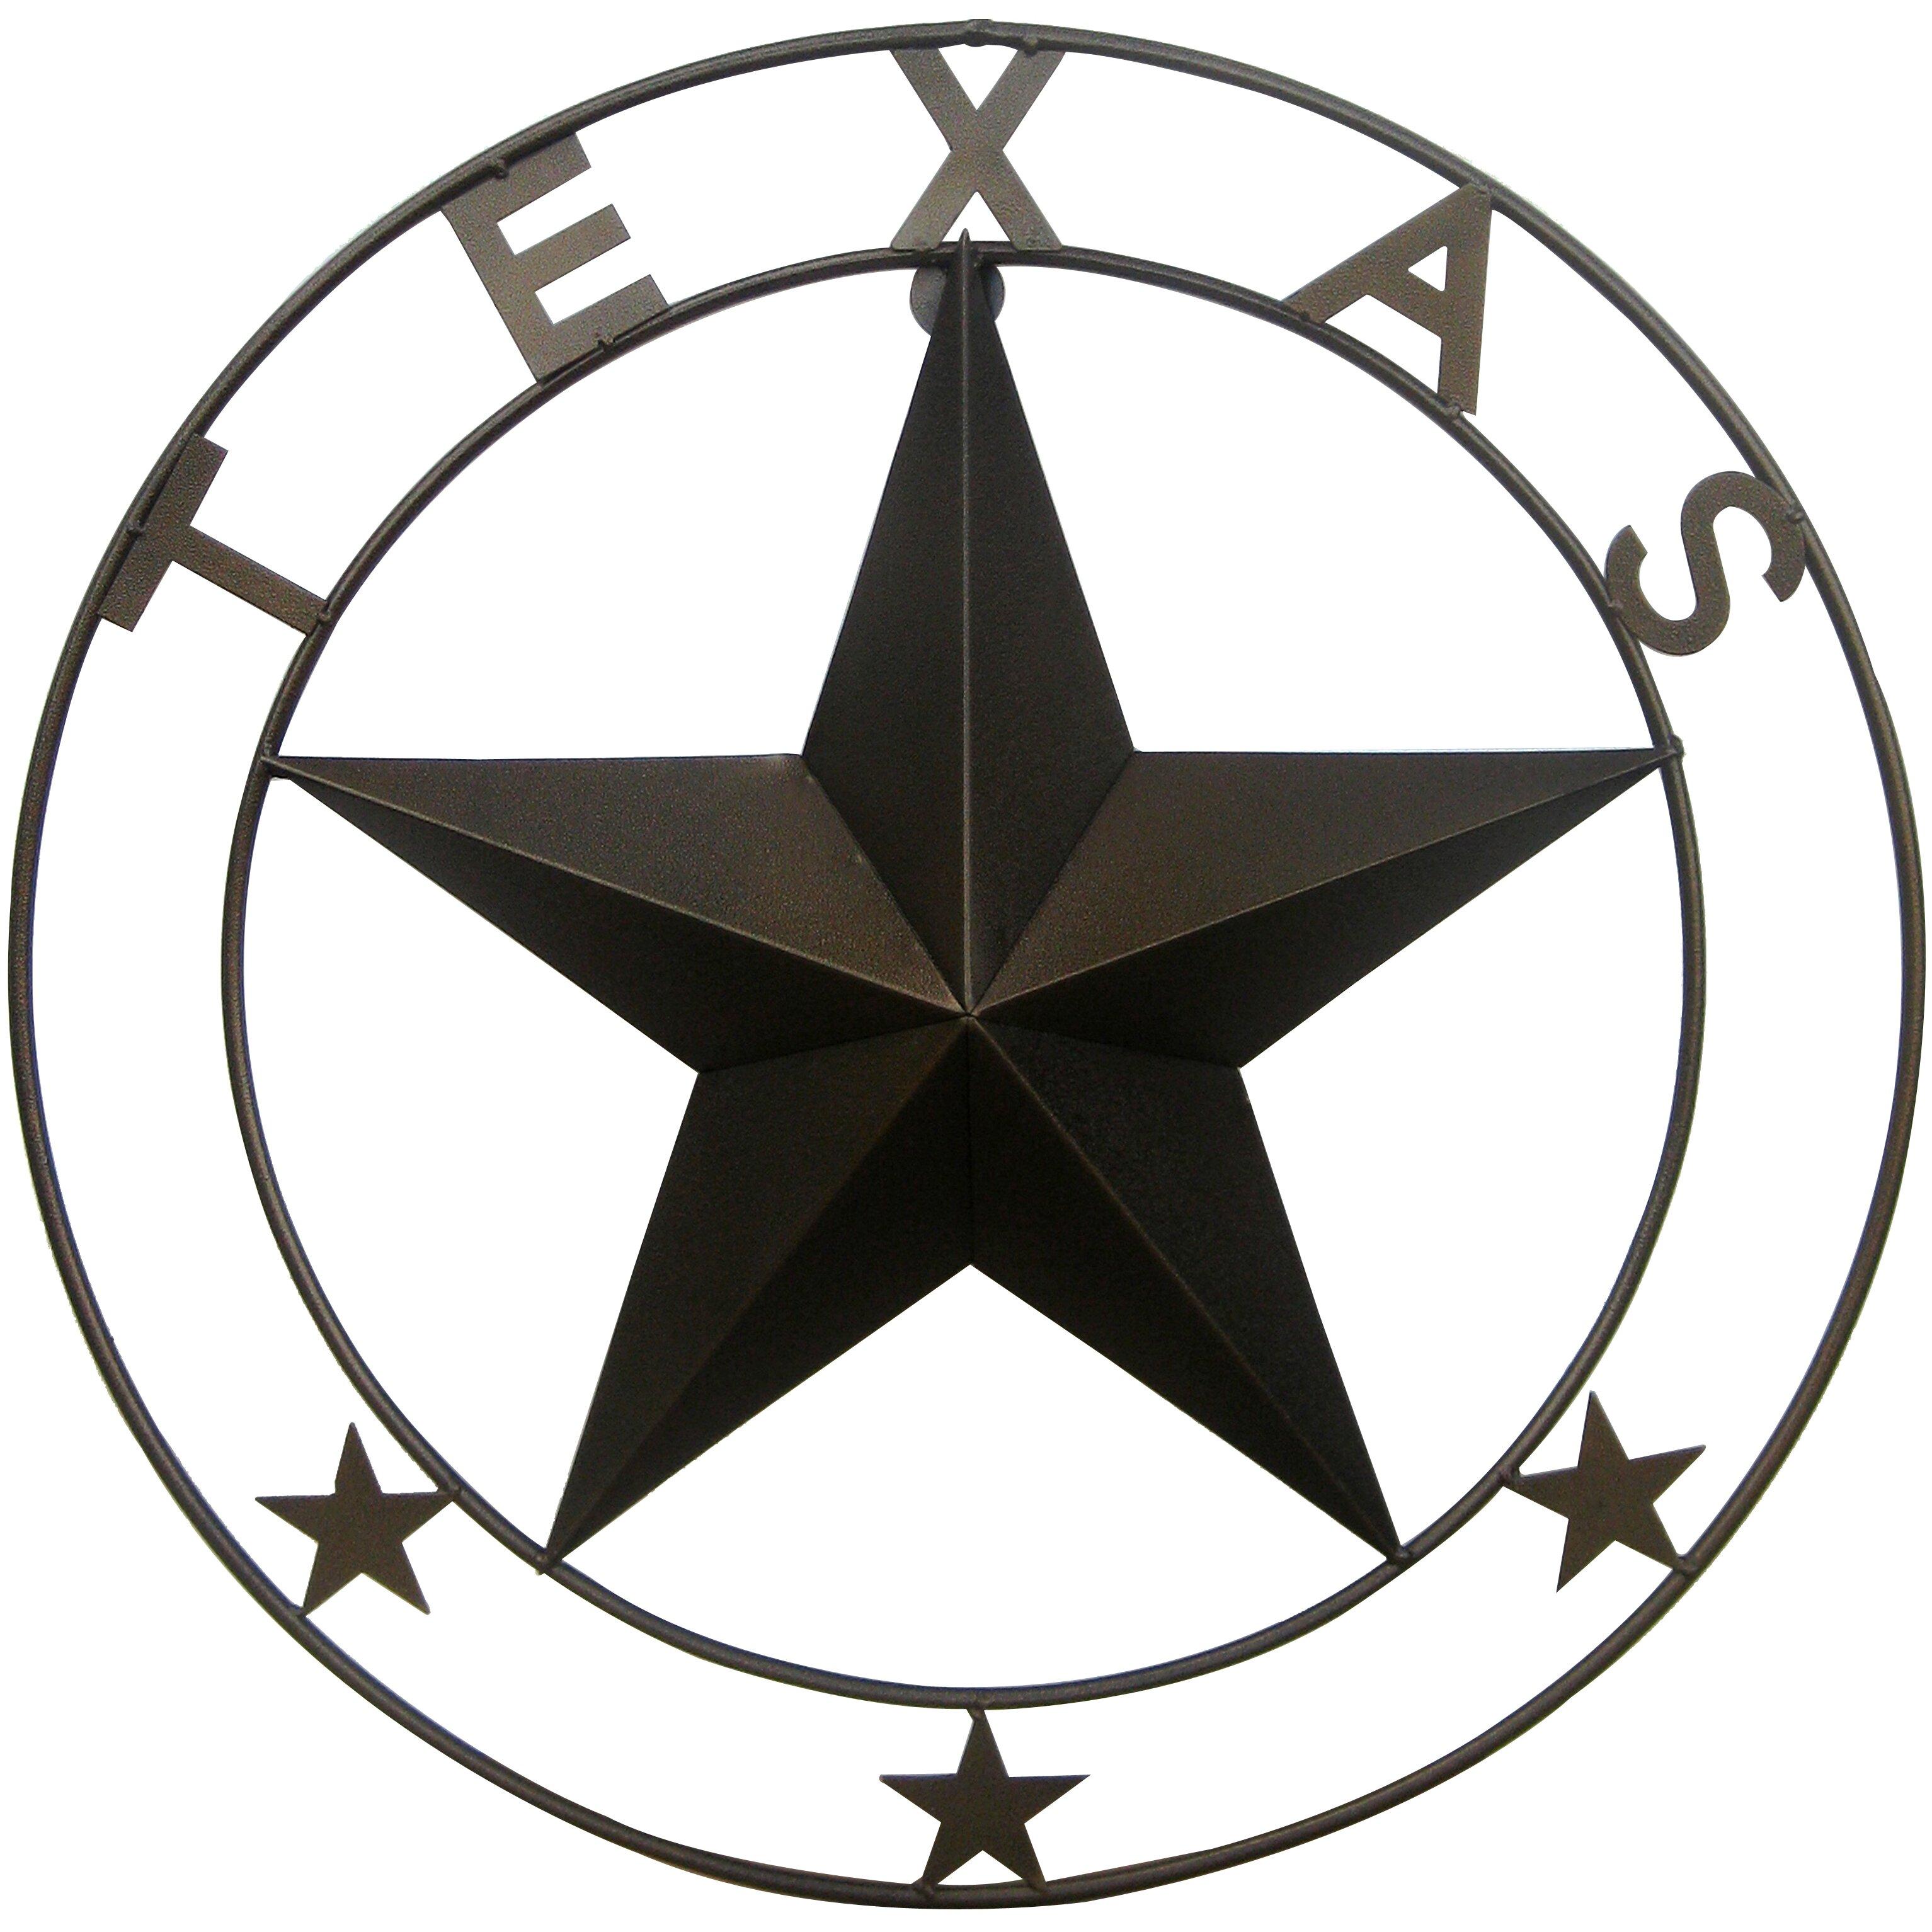 Glass Star Wall Decor : Leighcountry double ringed texas star wall d?cor reviews